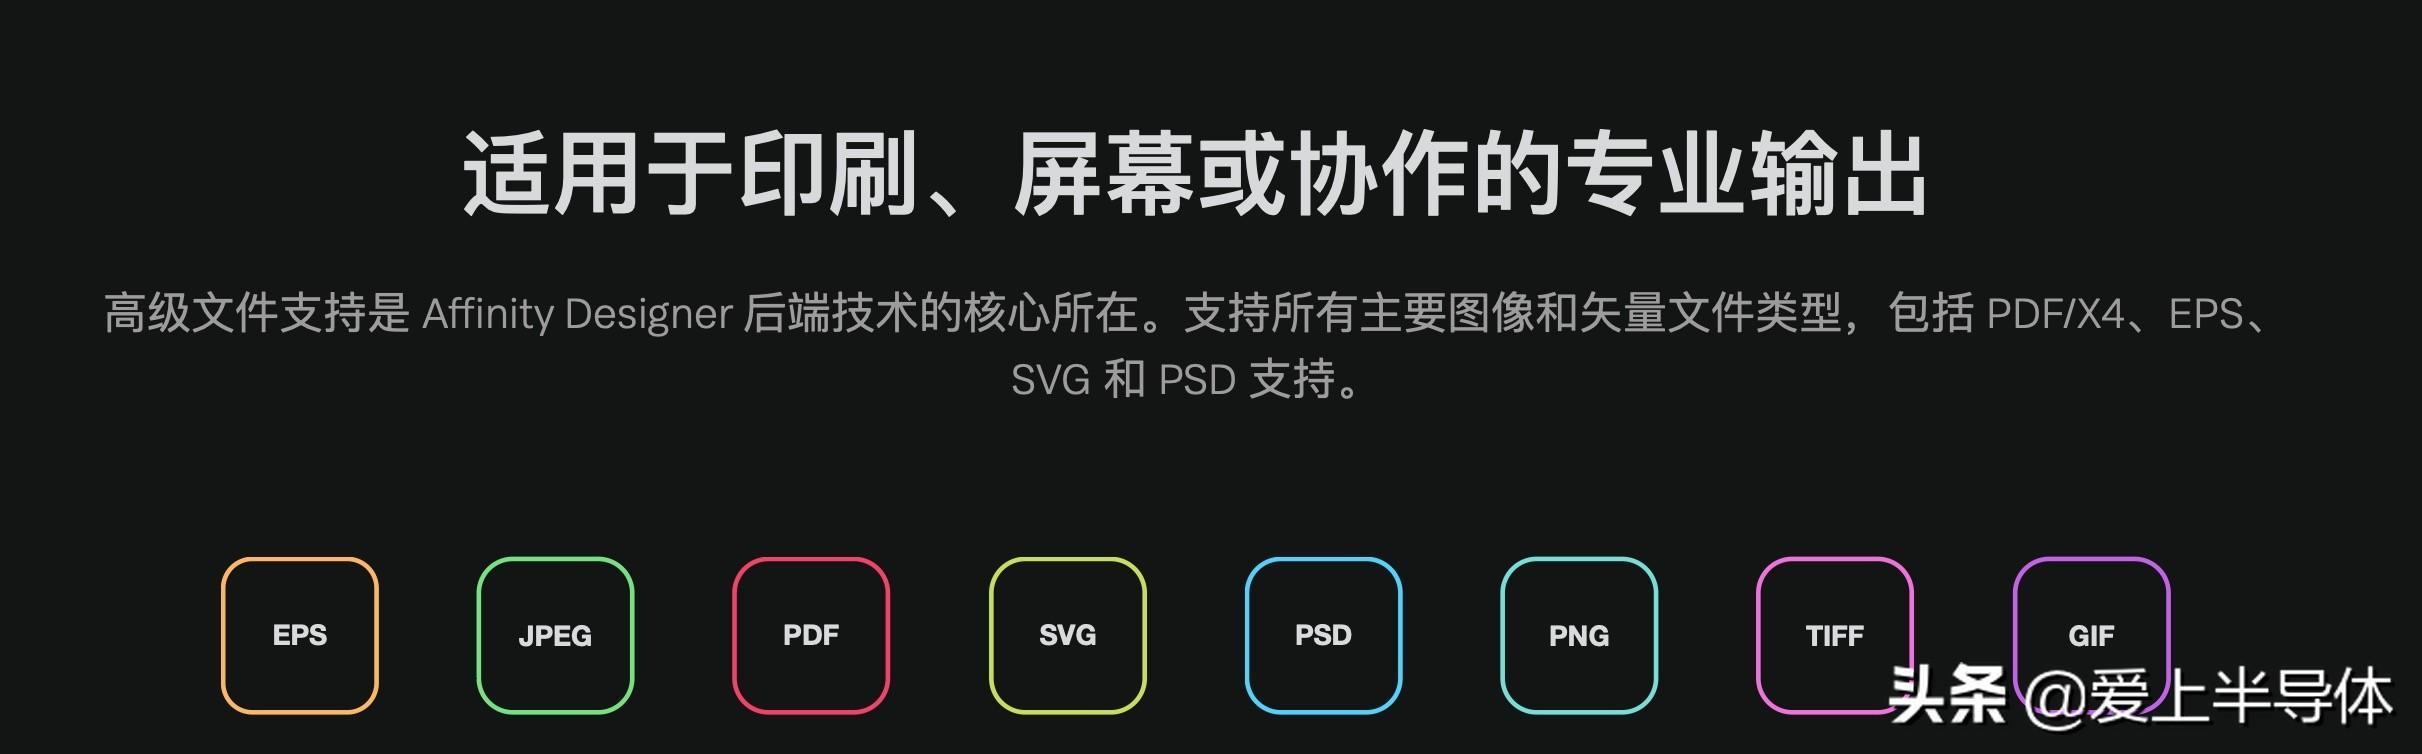 mac网站设计,mac是什么意思